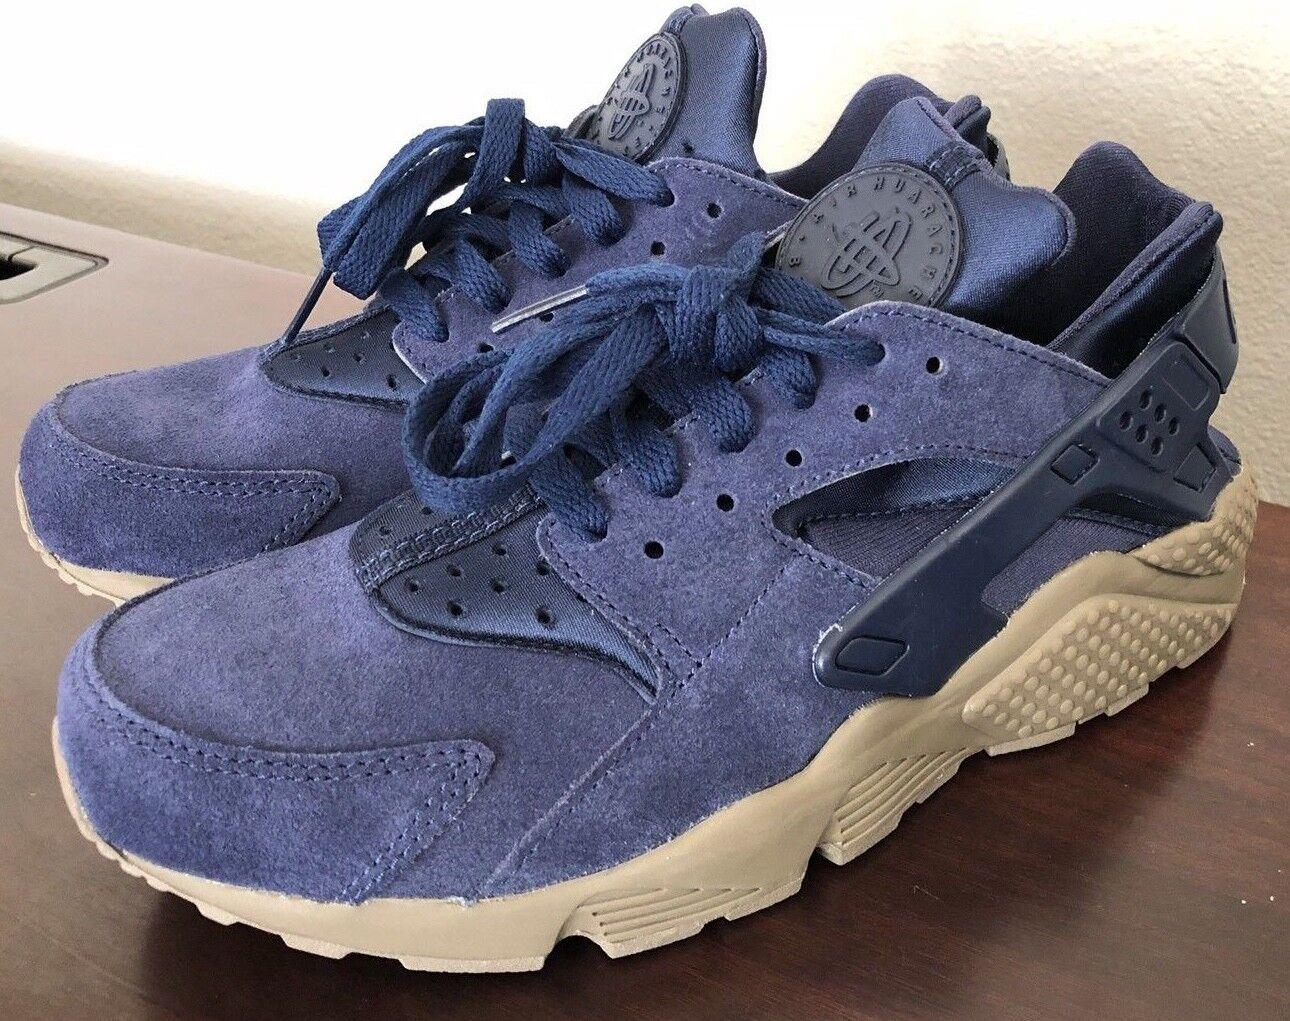 Nike Air huarache 7,5 Run PMR se tamaño: 7,5 huarache 852628-400 Binary azul oscuro m nueva marca 4ad66a